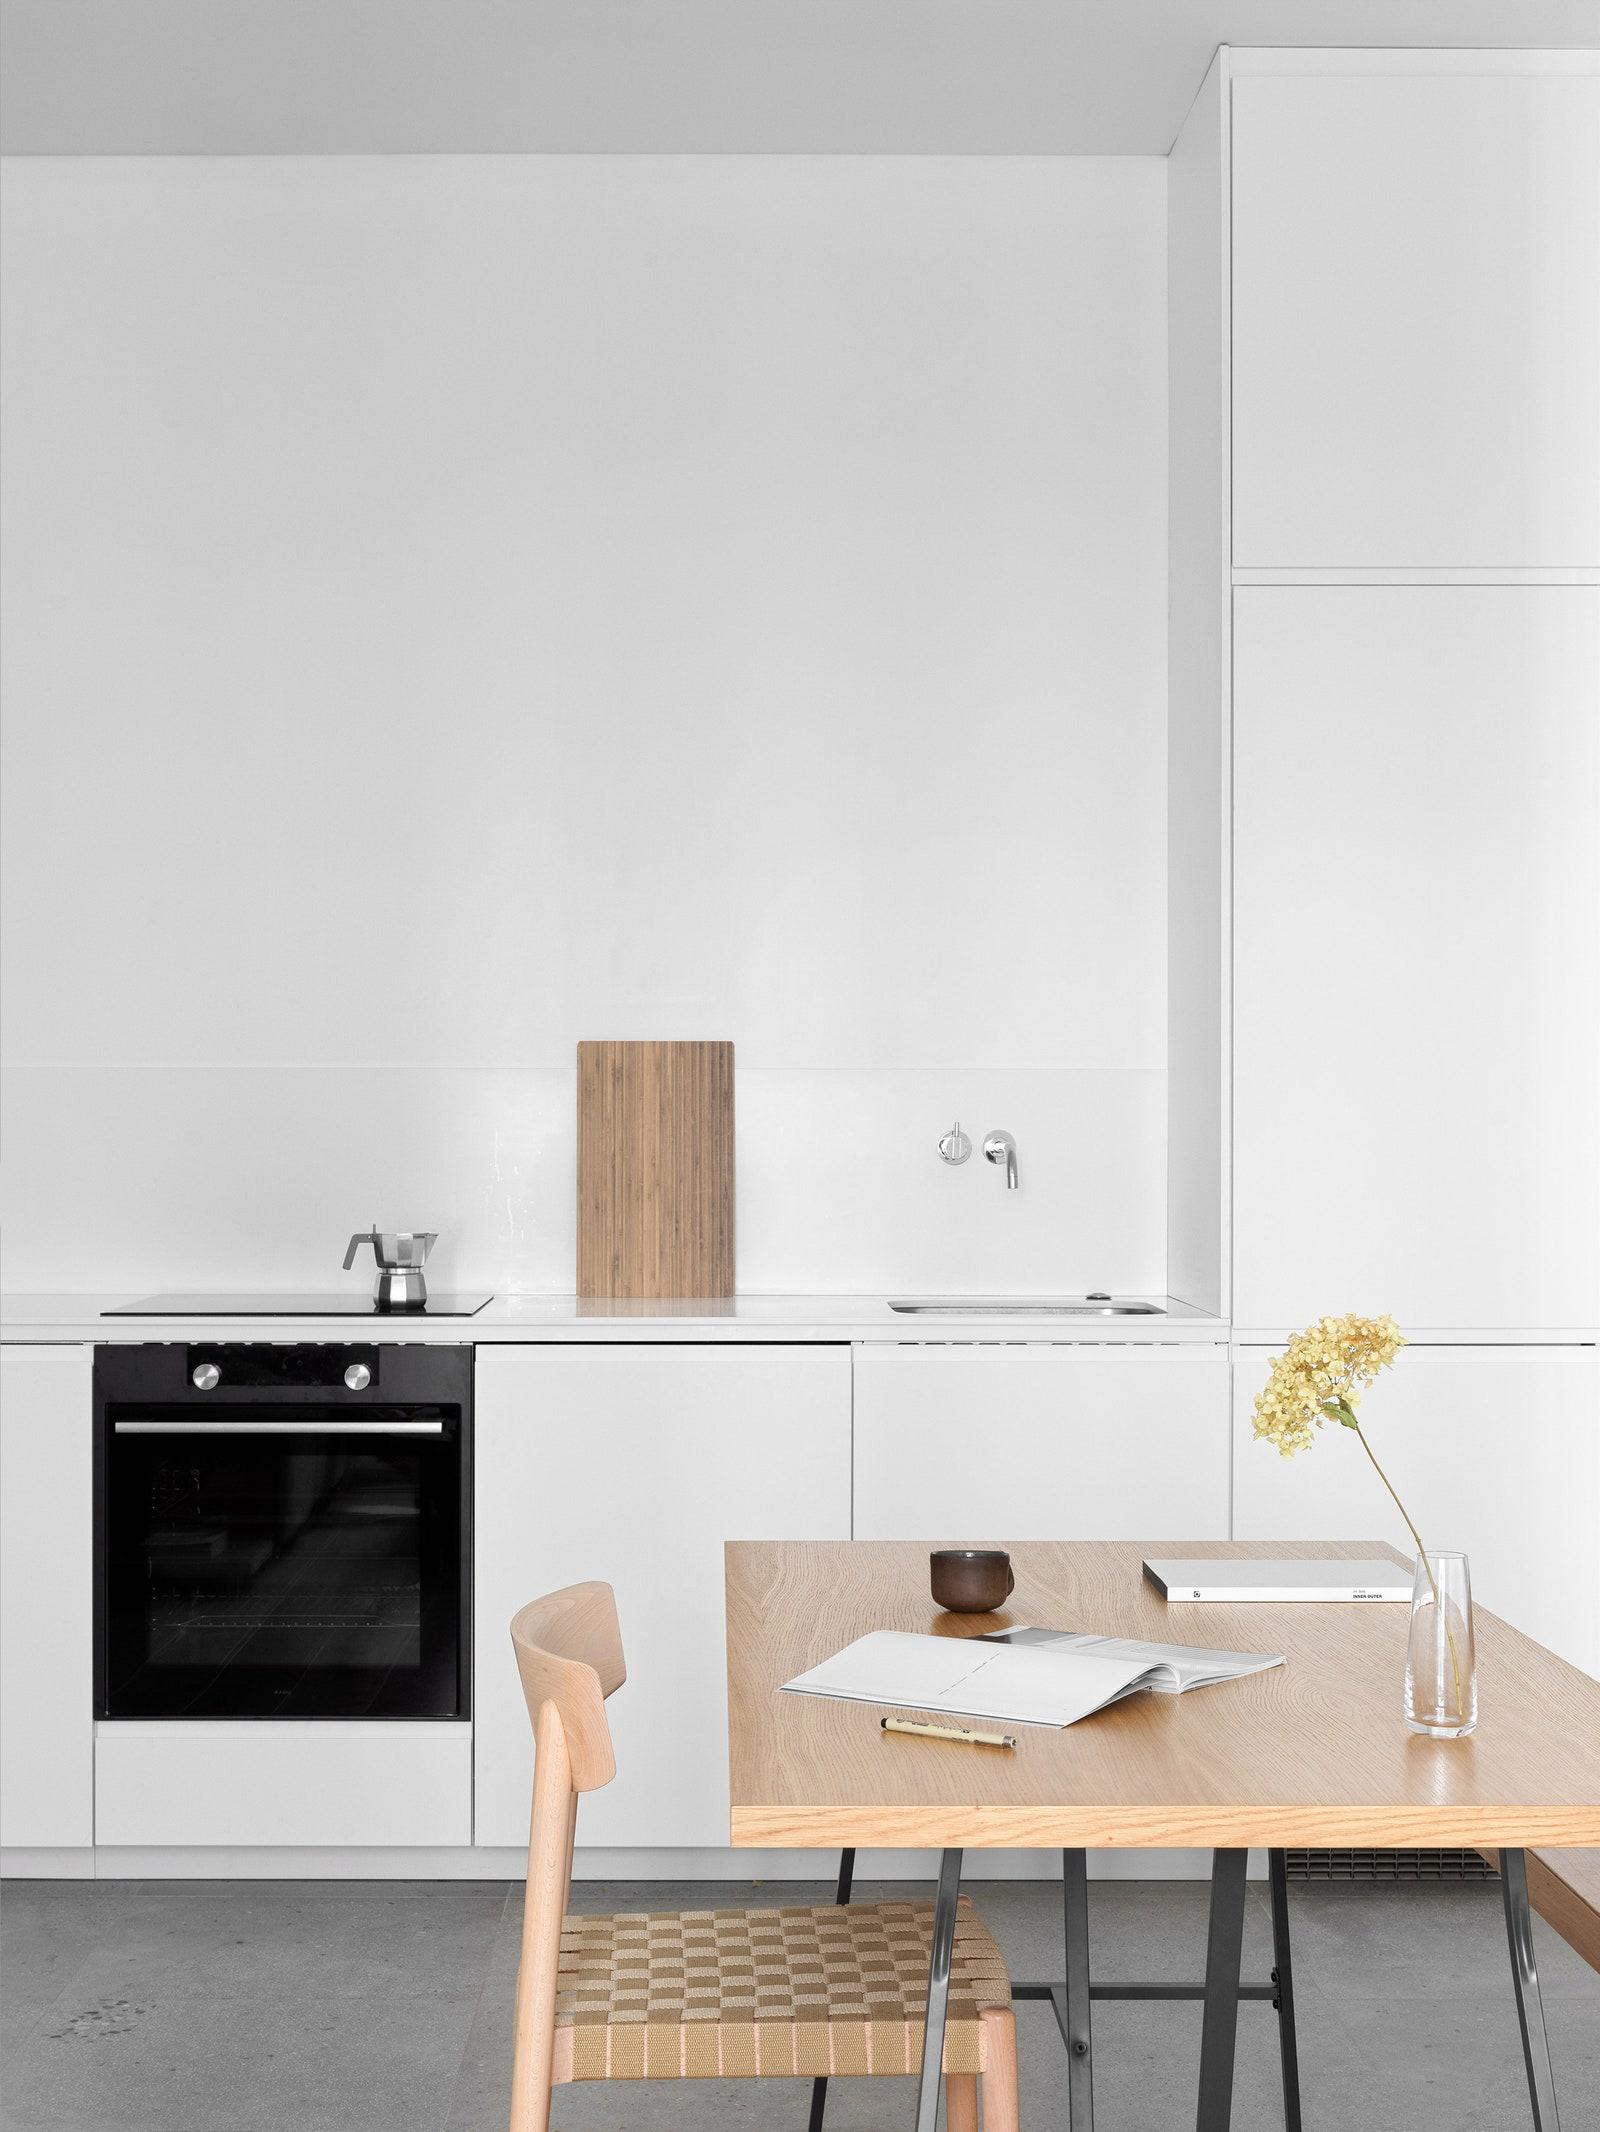 .  Andreu World    IKEA        IKEA         Asko       Vola  Alessi  Ceramica Fioranese.